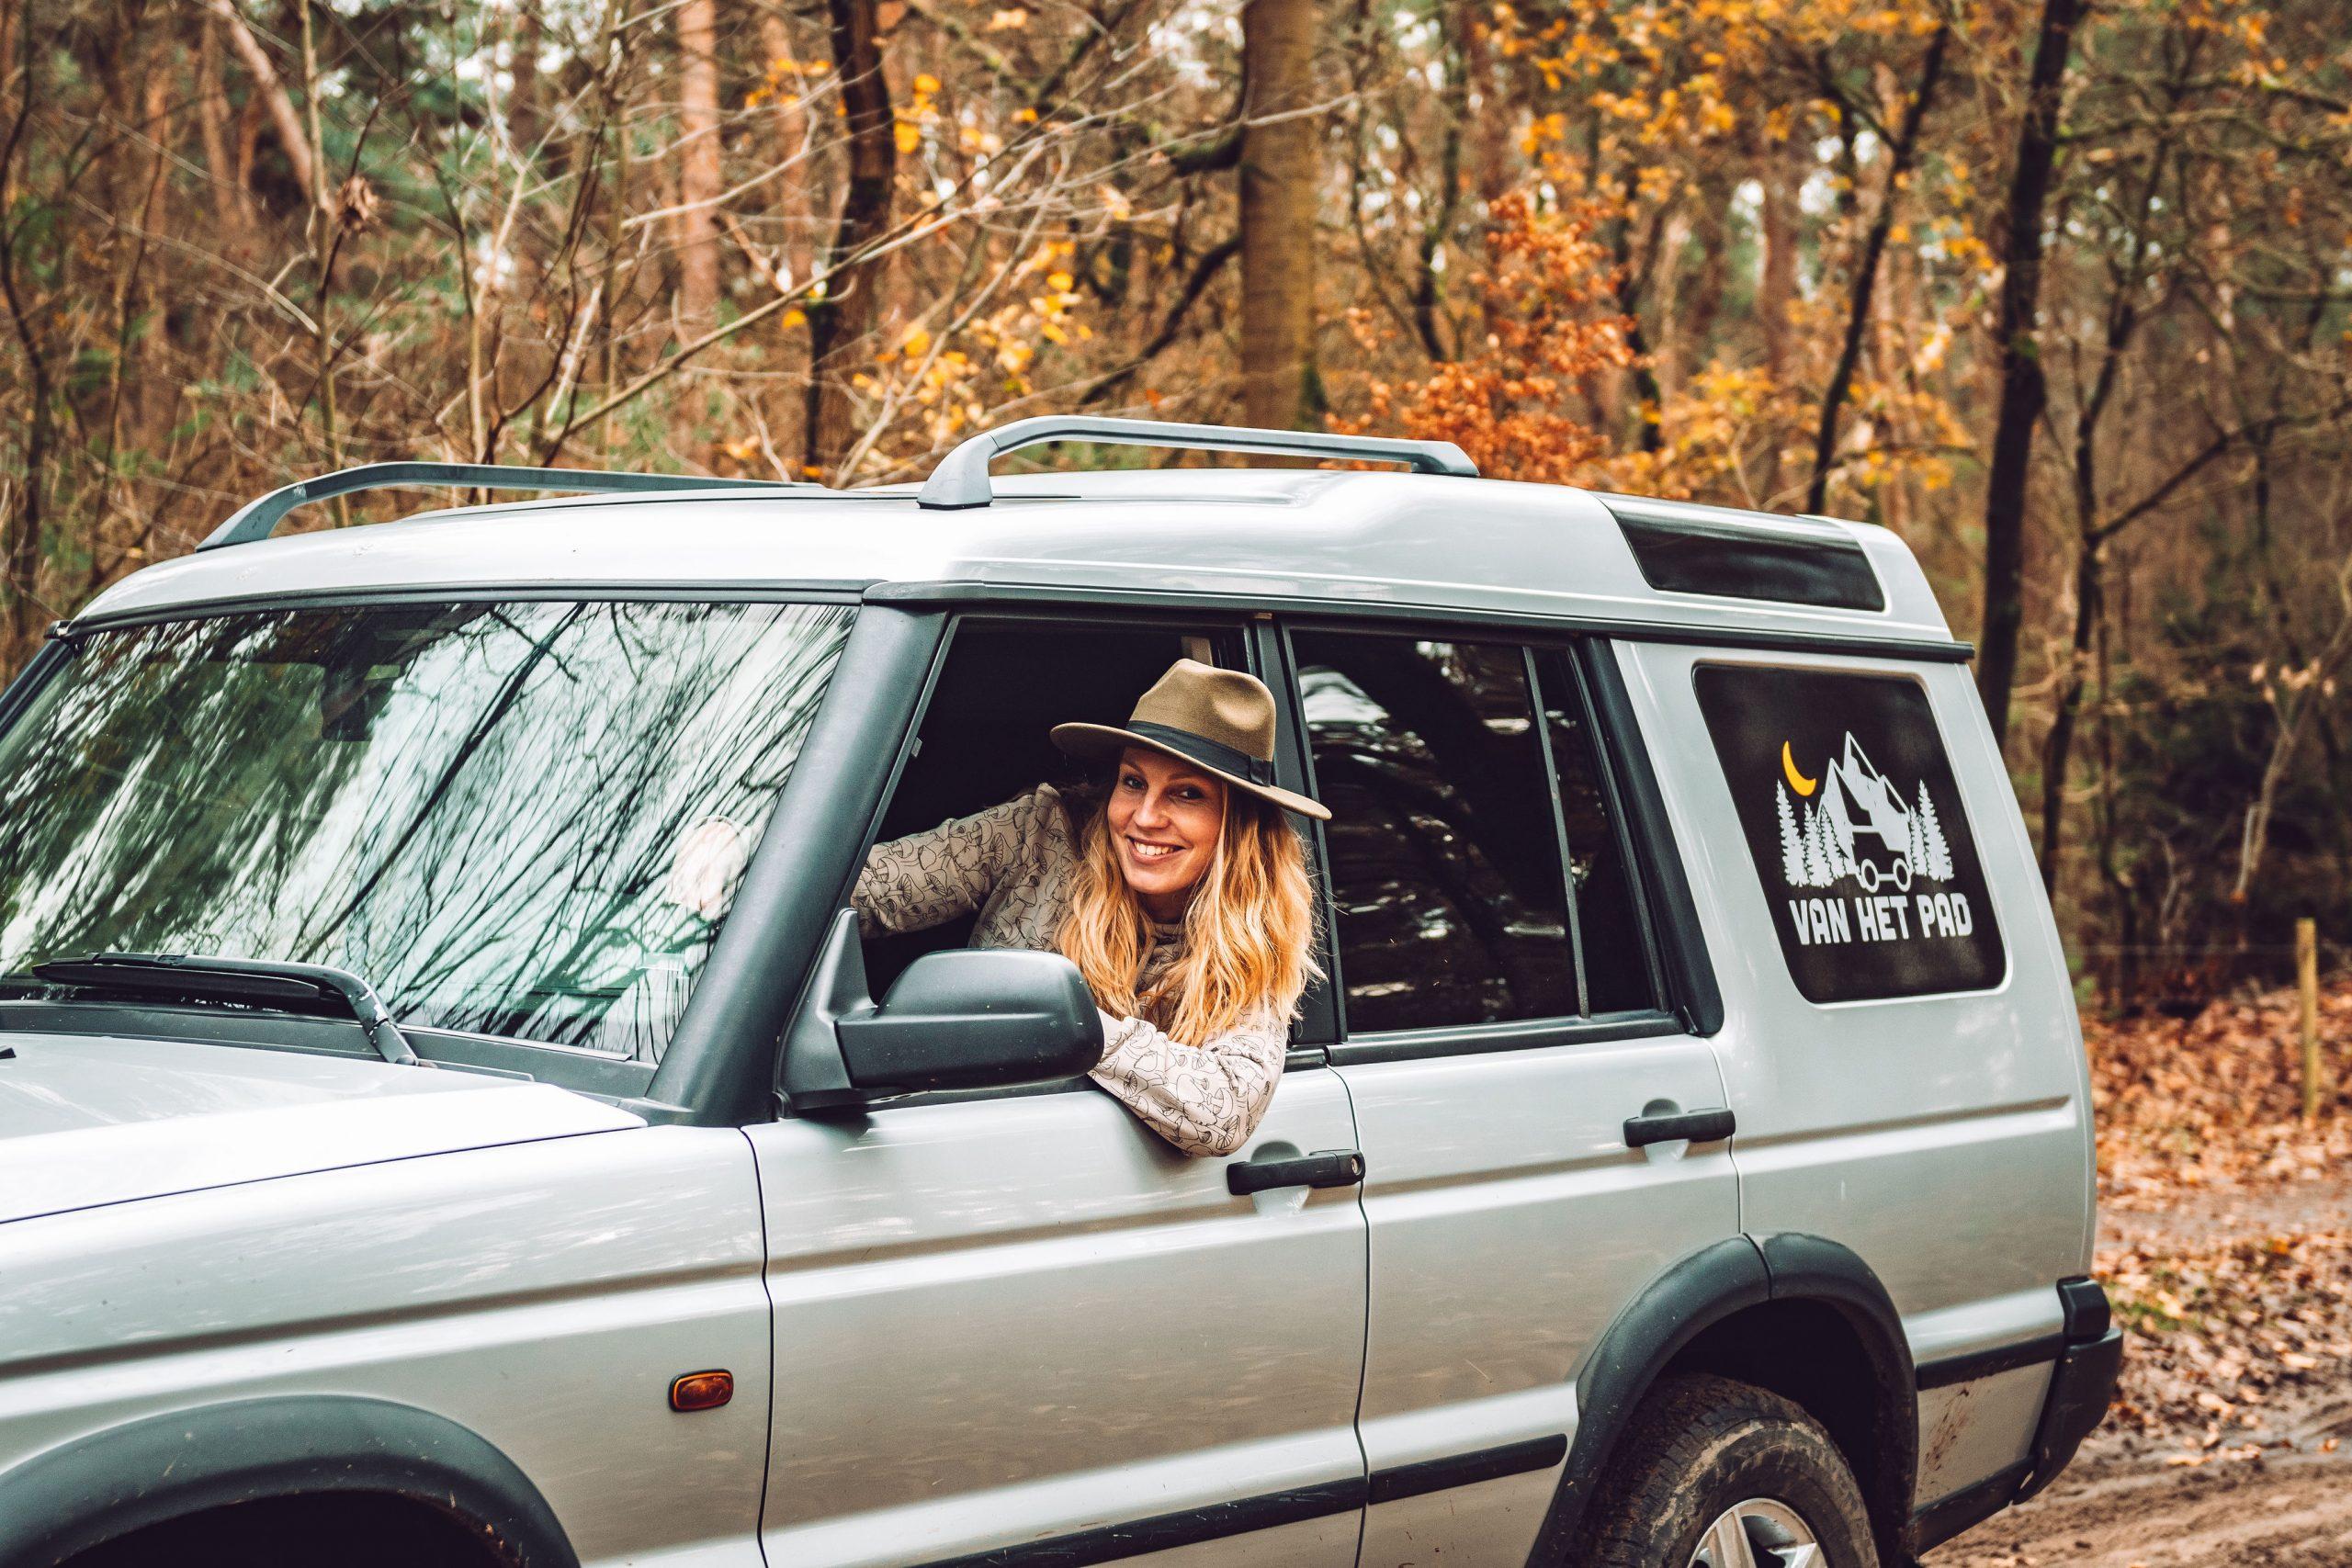 Fotoshoot Where She Goes | Arvik | 4 december 2020